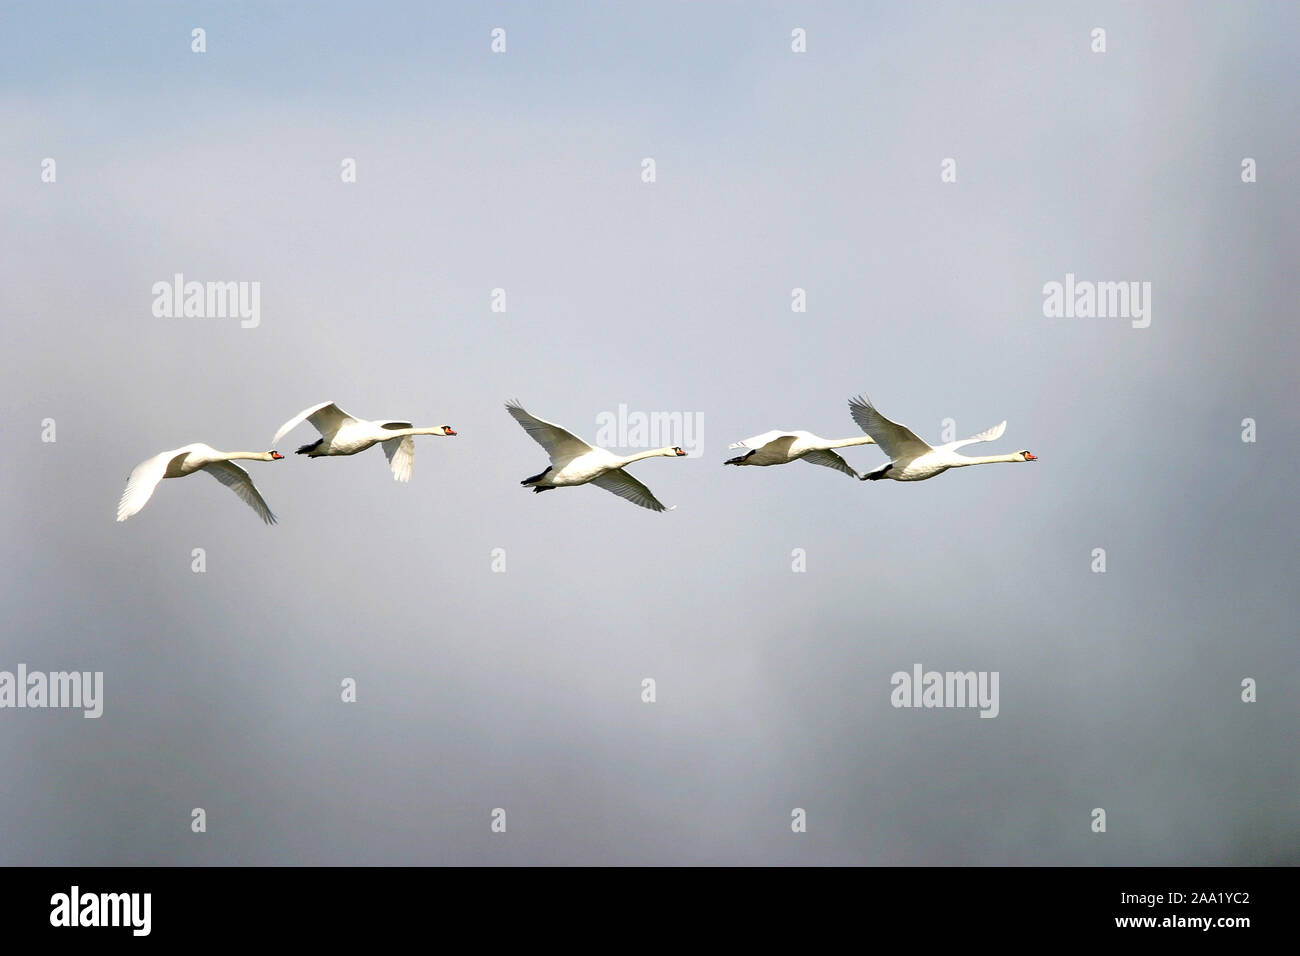 Fliegende Höckerschwäne (Cygnus olor) / Flying mute swans (Cygnus olor) Stock Photo